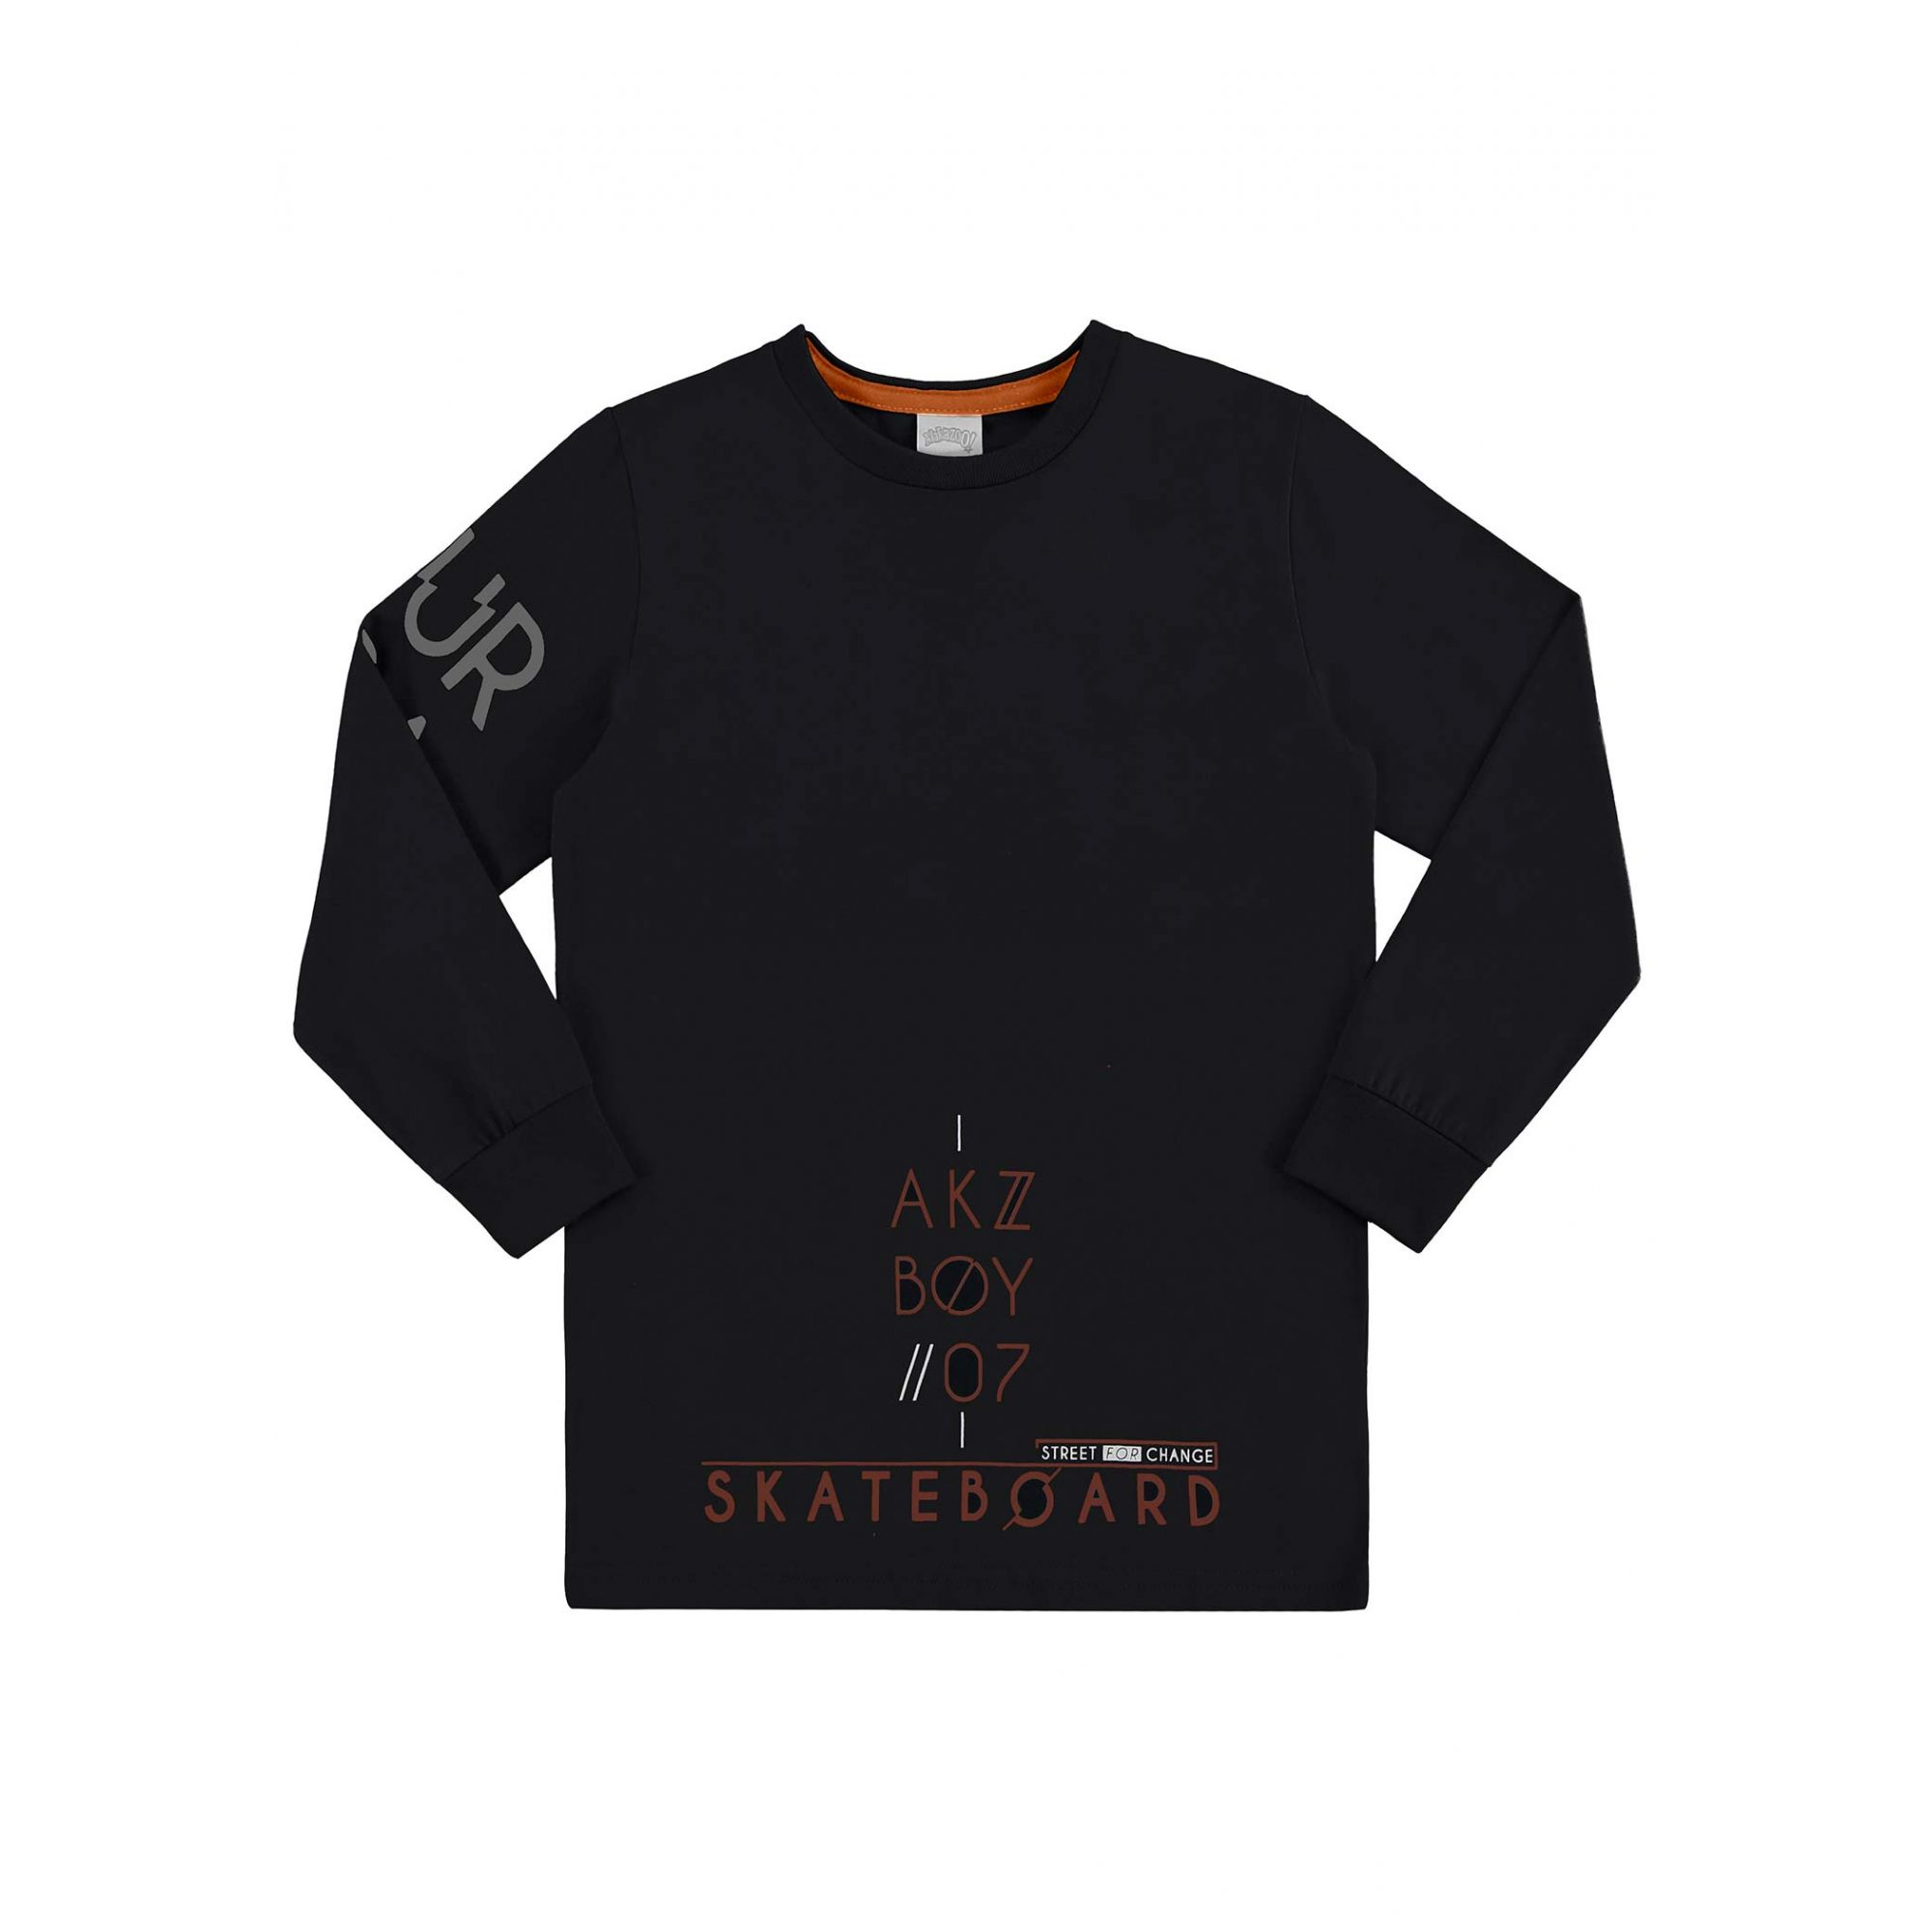 Camiseta Infantil Masculina Inverno Preta Boy Alakazoo